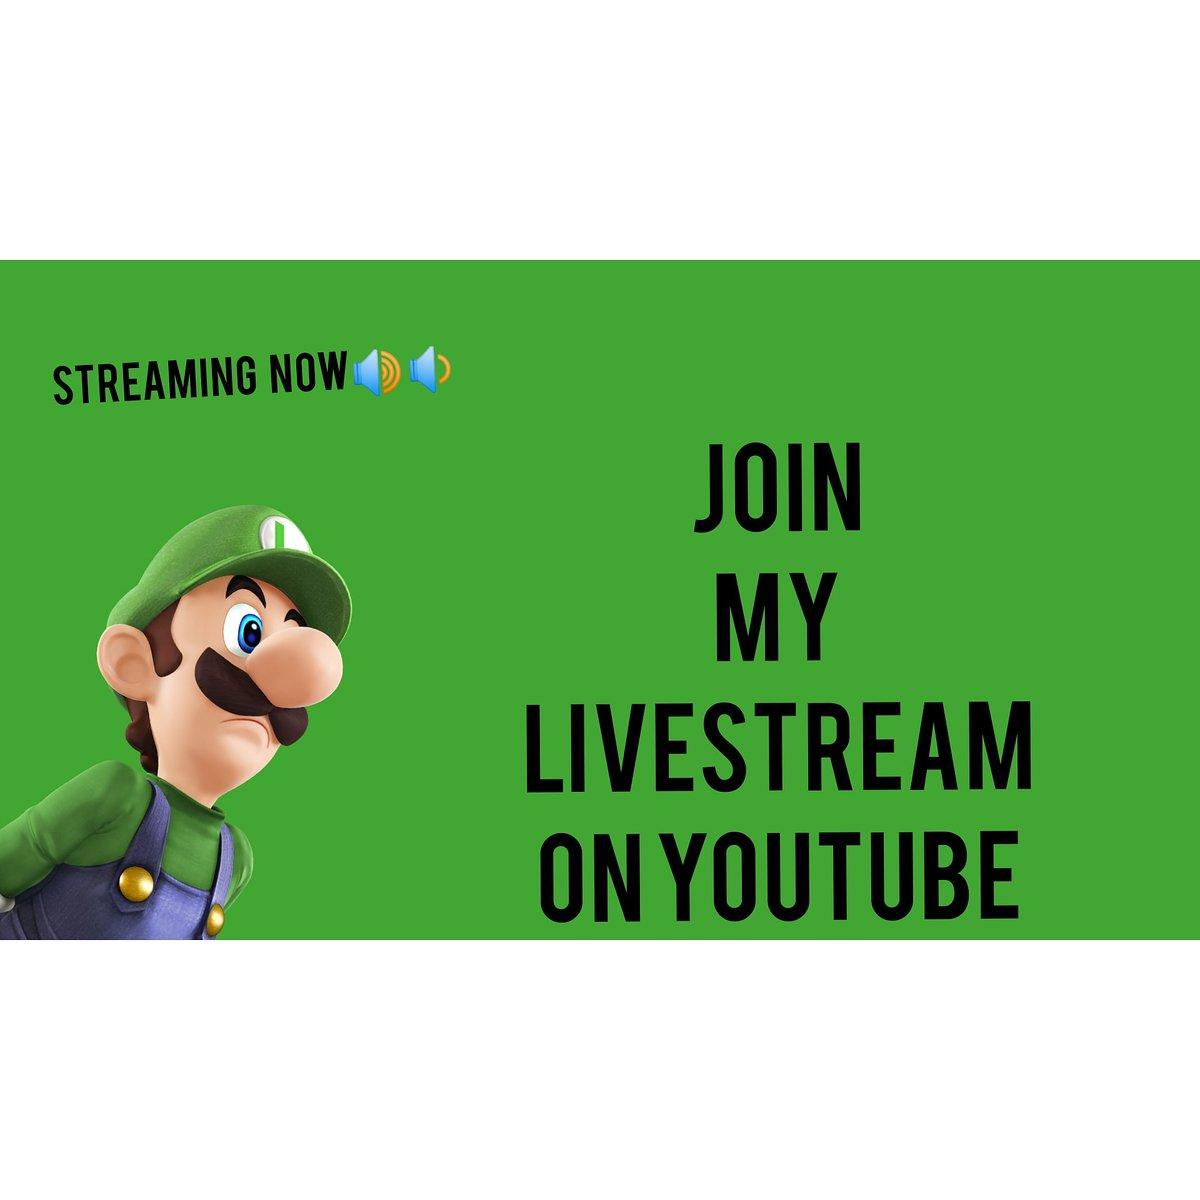 ⬆️⬆️STREAMING NOW⬆️⬆️ #MarioBros #SuperMarioMaker2 #SuperMarioBros #SuperMarioOdyssey #game #gamers #Livestream #Nintendo #sundayvibes #Subscribetomychannel #DynamiteTo800M #marioparty